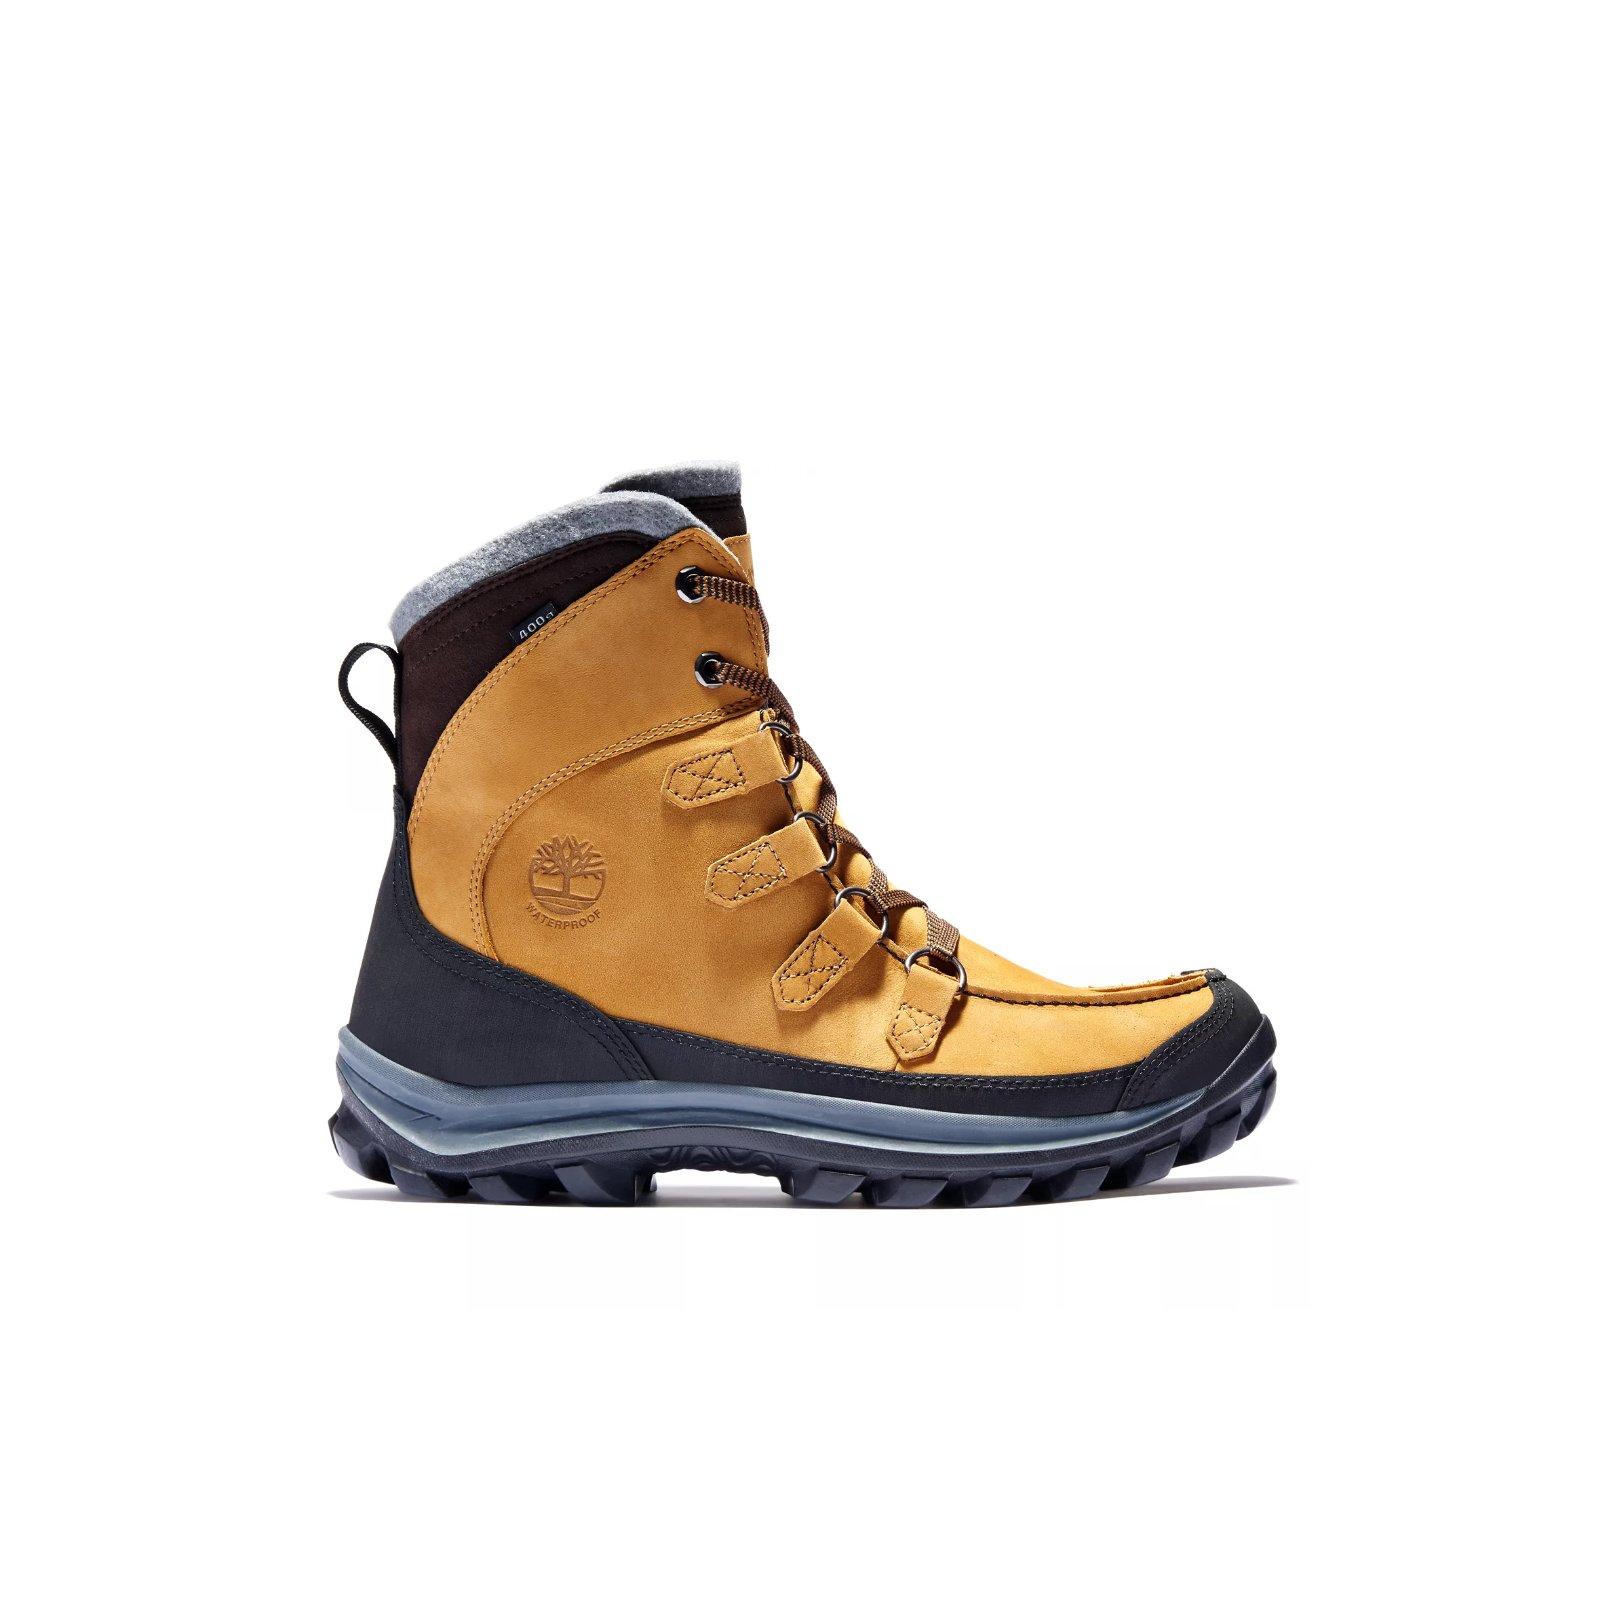 Chillberg Premium Waterproof Boot - Men's